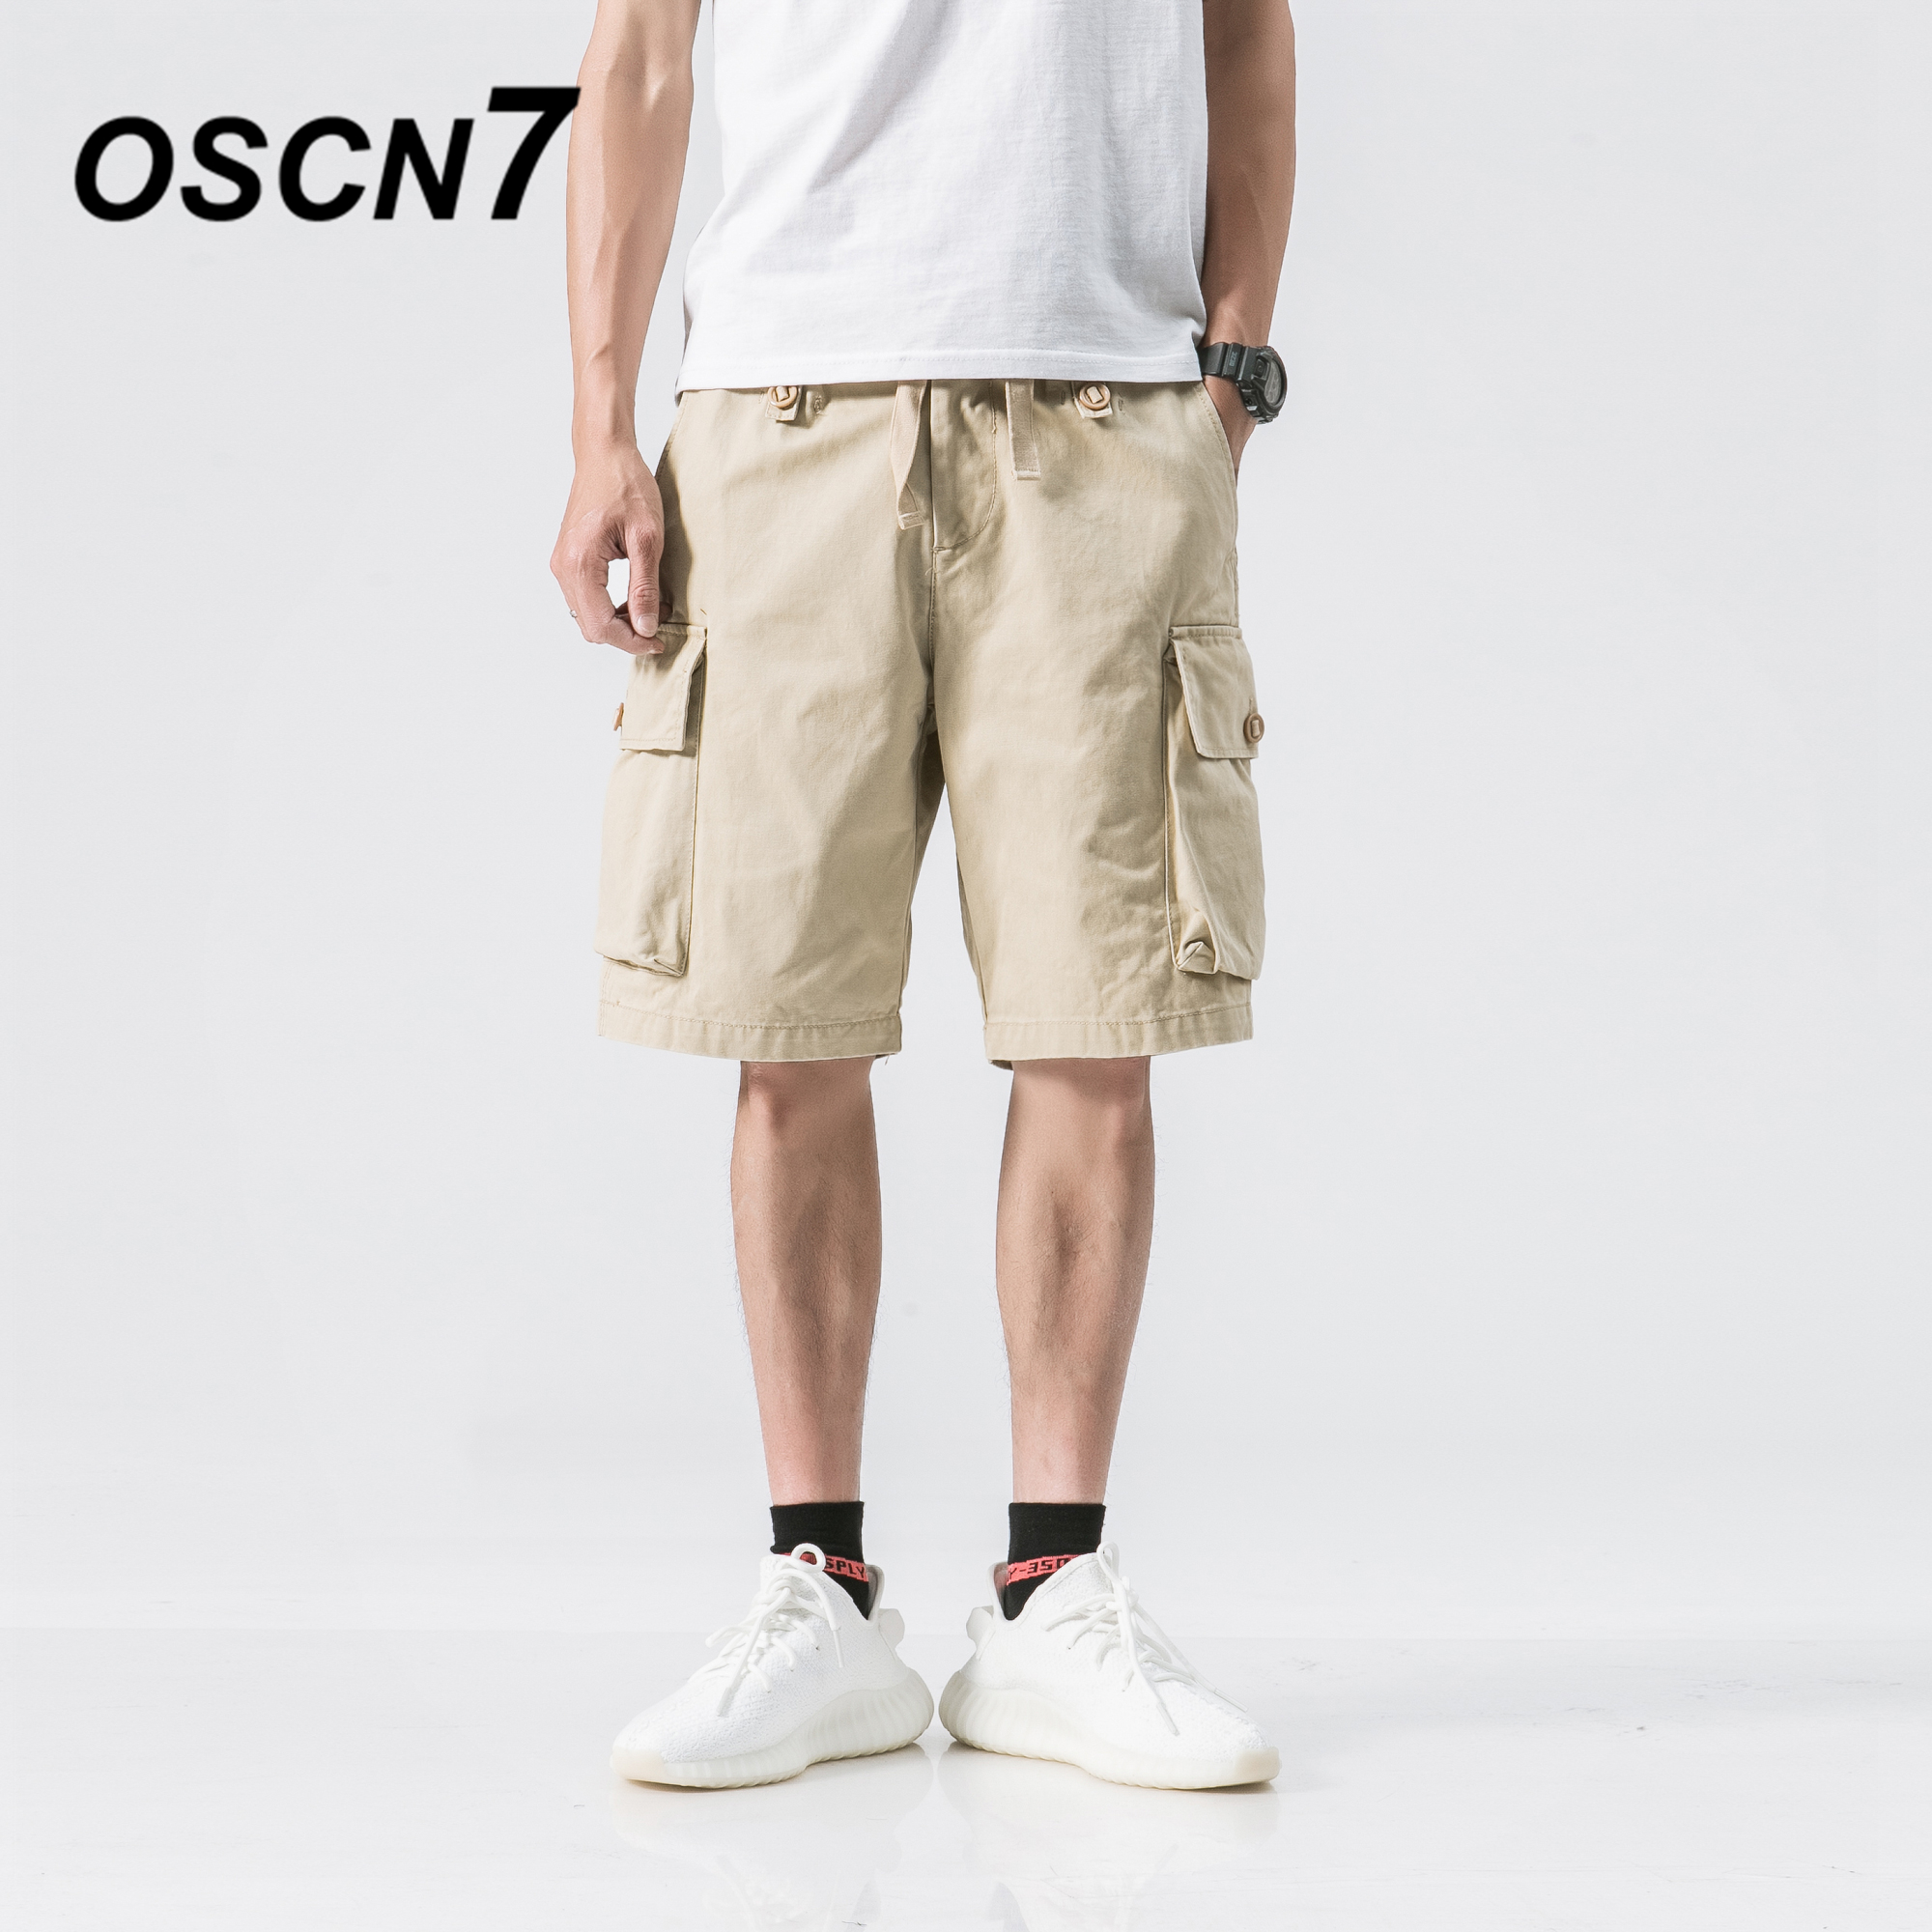 OSCN7 Fashion Casual Cargo Shorts Men Plus Size Leisure Solid Shorts Men Cargo 2018 New Mens Short Pants M259